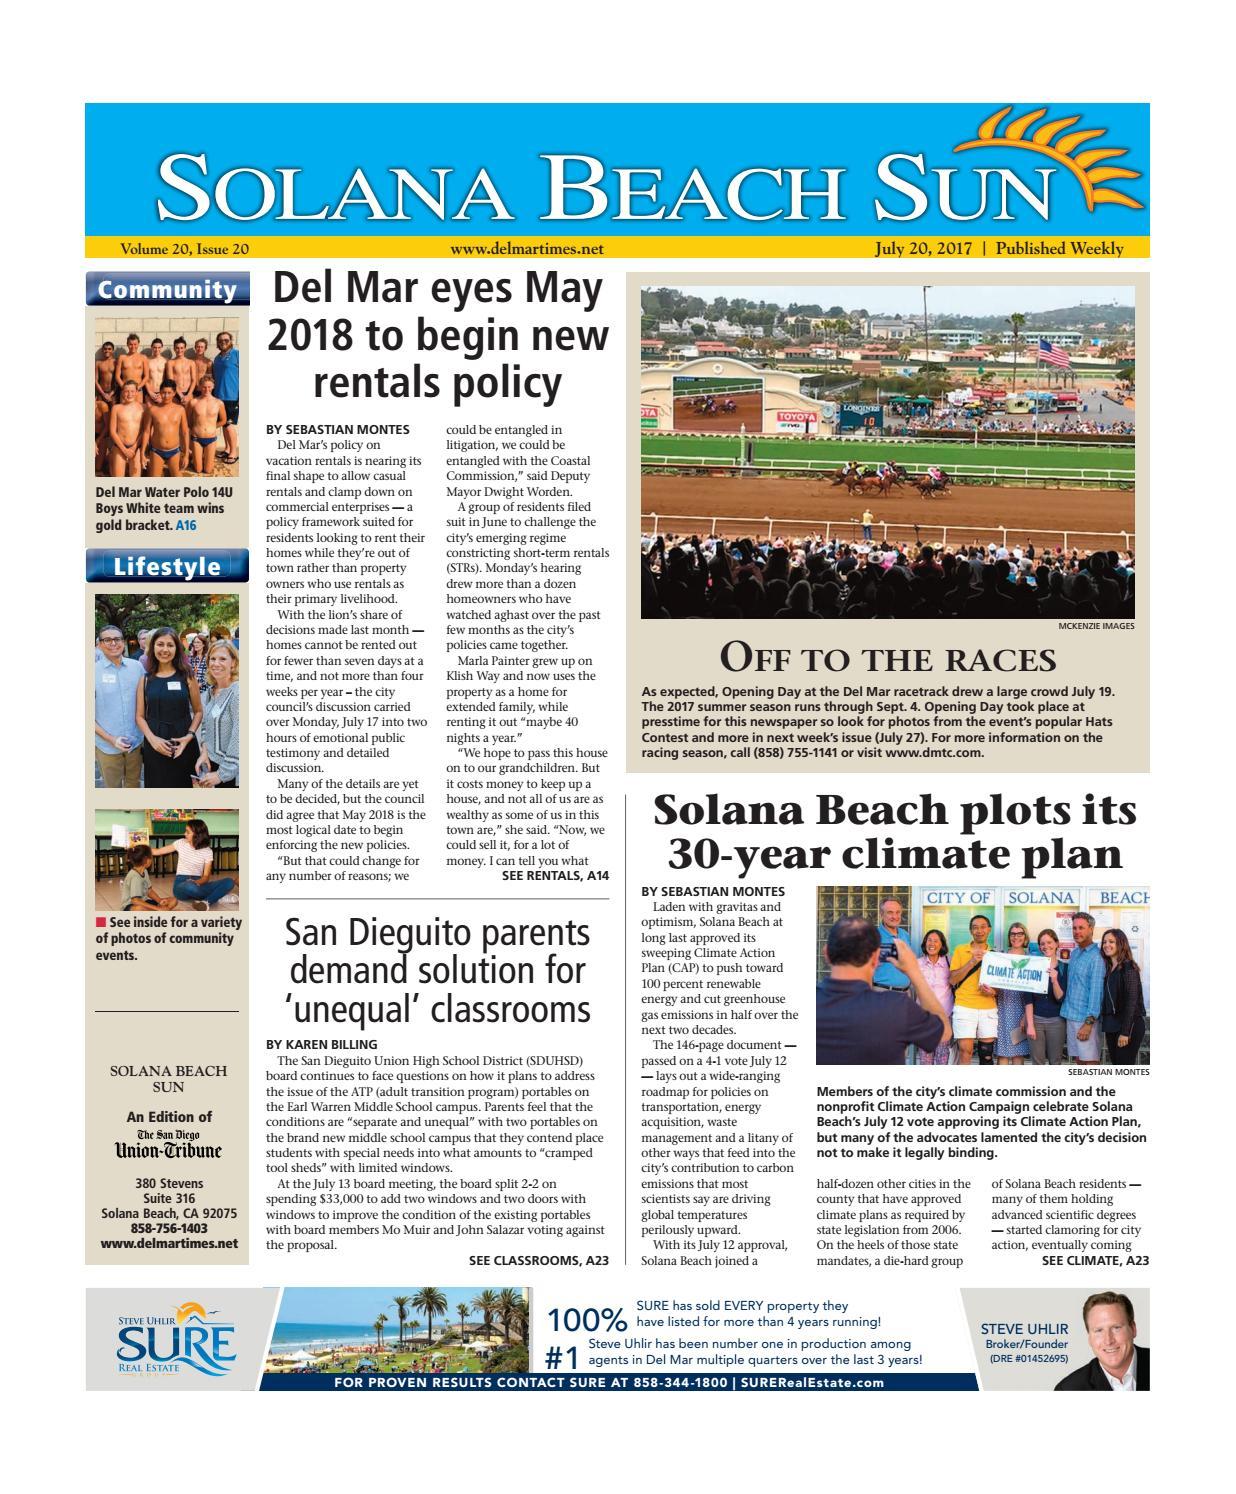 b9fb204b4e9 Solana Beach Sun 07 20 17 by MainStreet Media - issuu